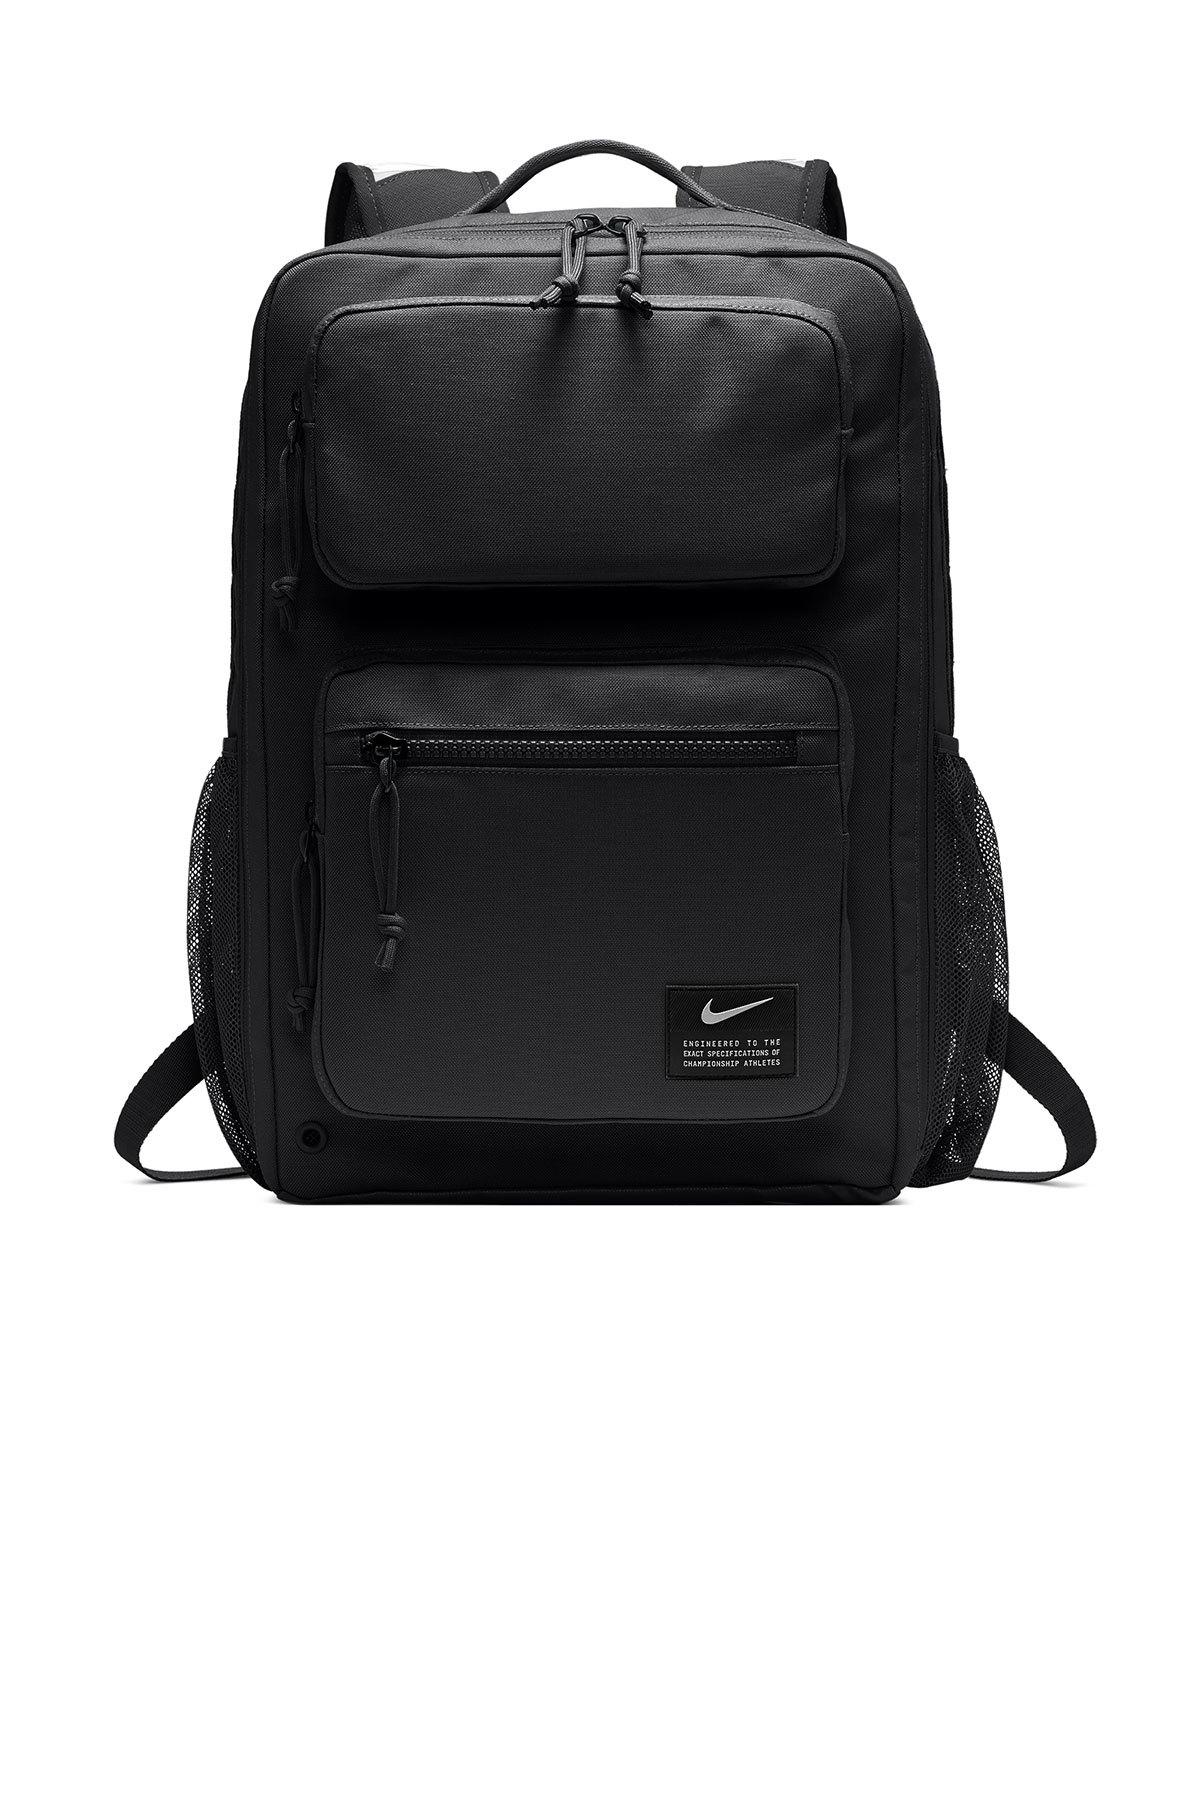 Nike CK2668 - Utility Speed Backpack